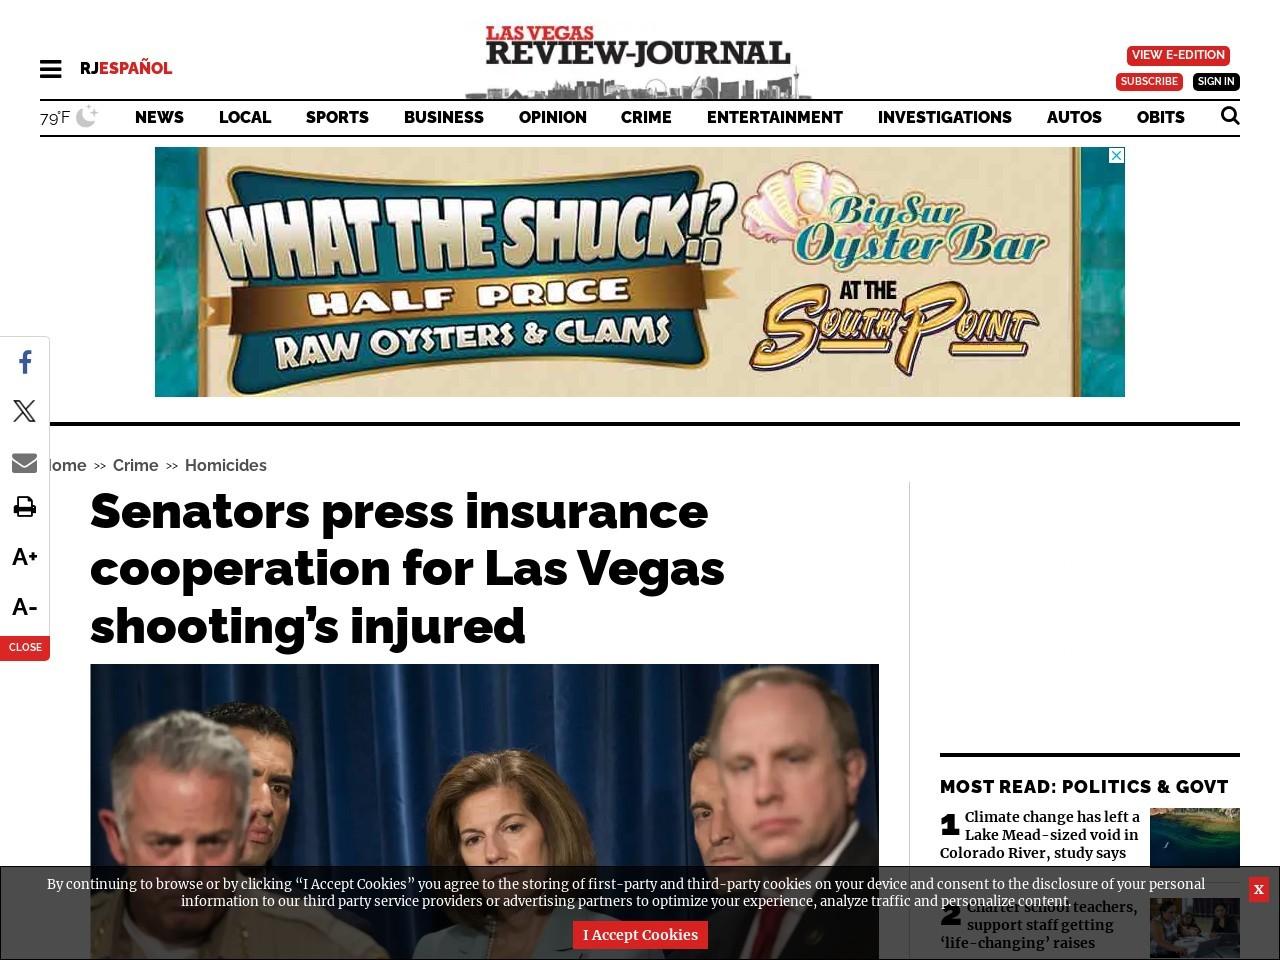 Senators press insurance cooperation for Las Vegas shooting's injured